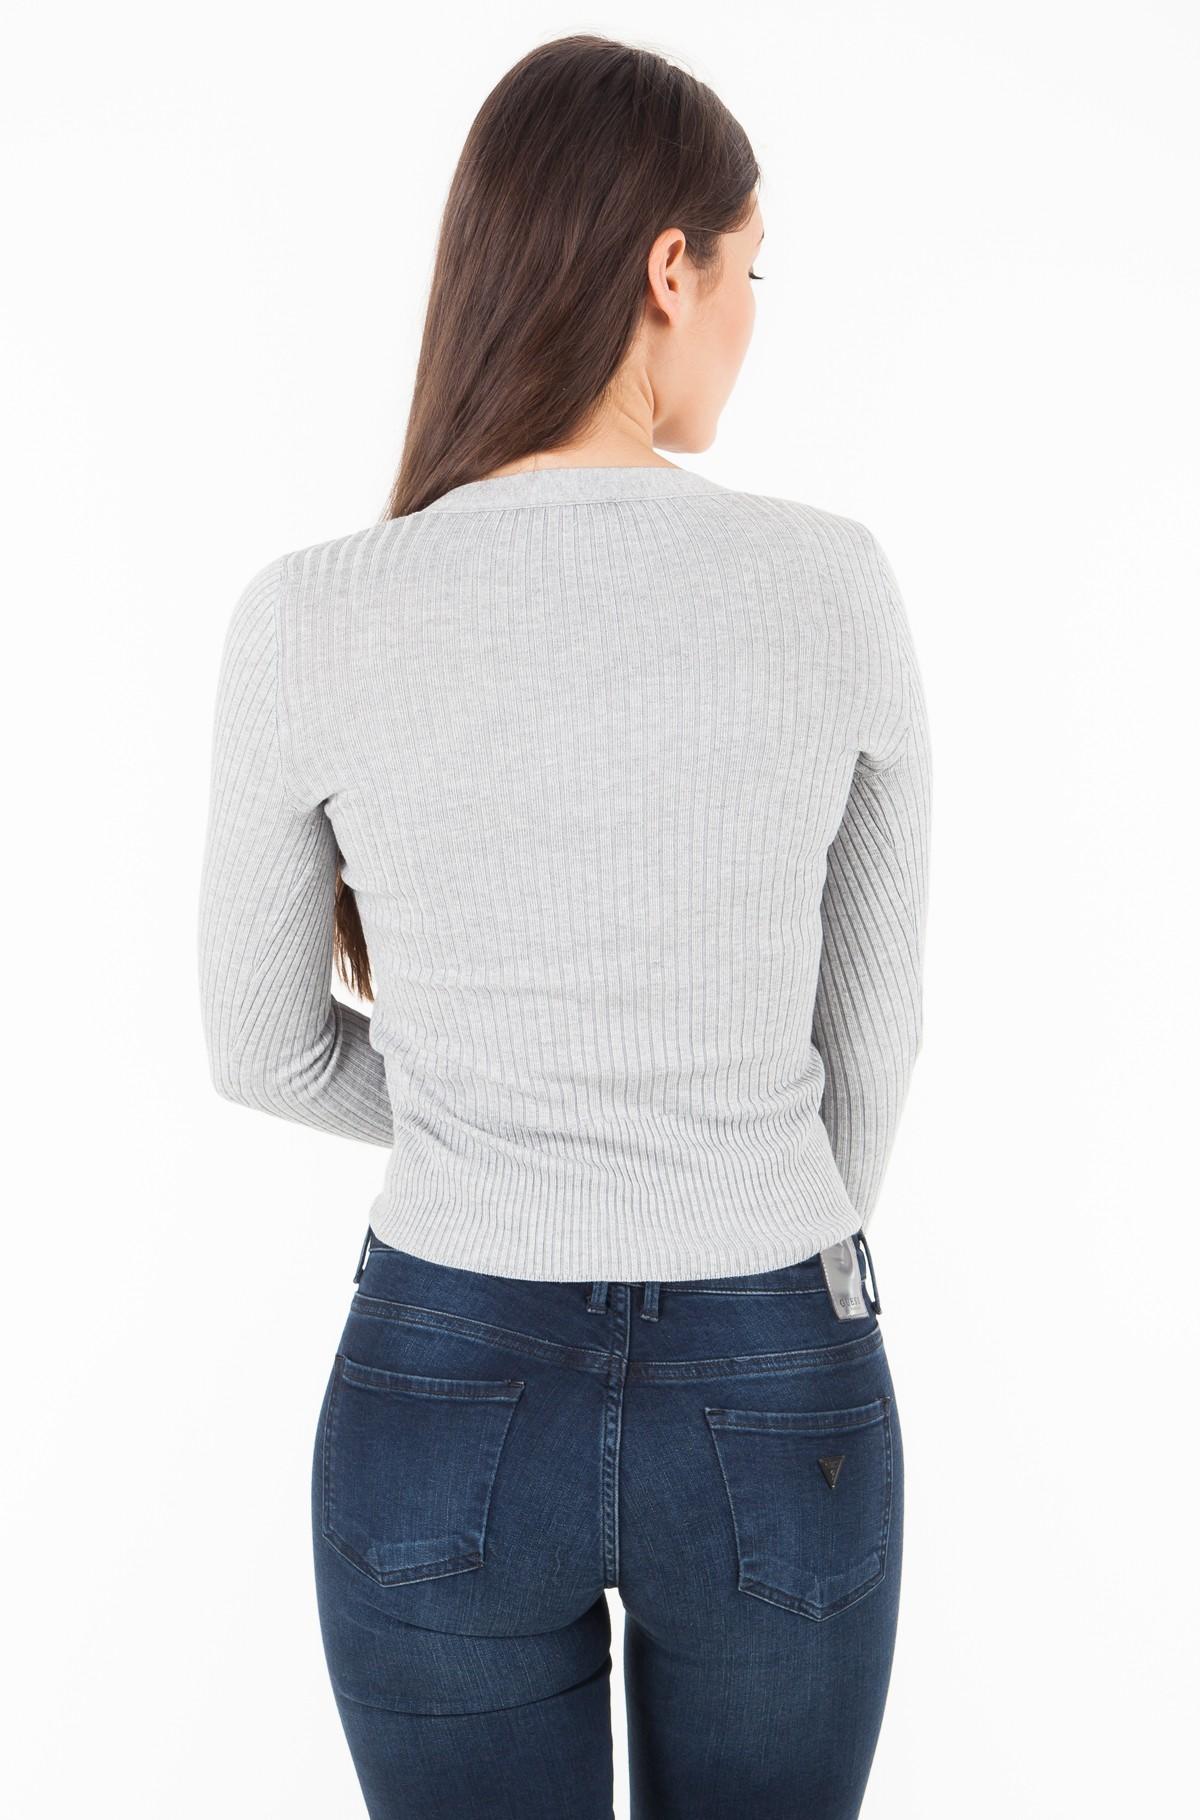 Sweater W81R10 R1090-full-2